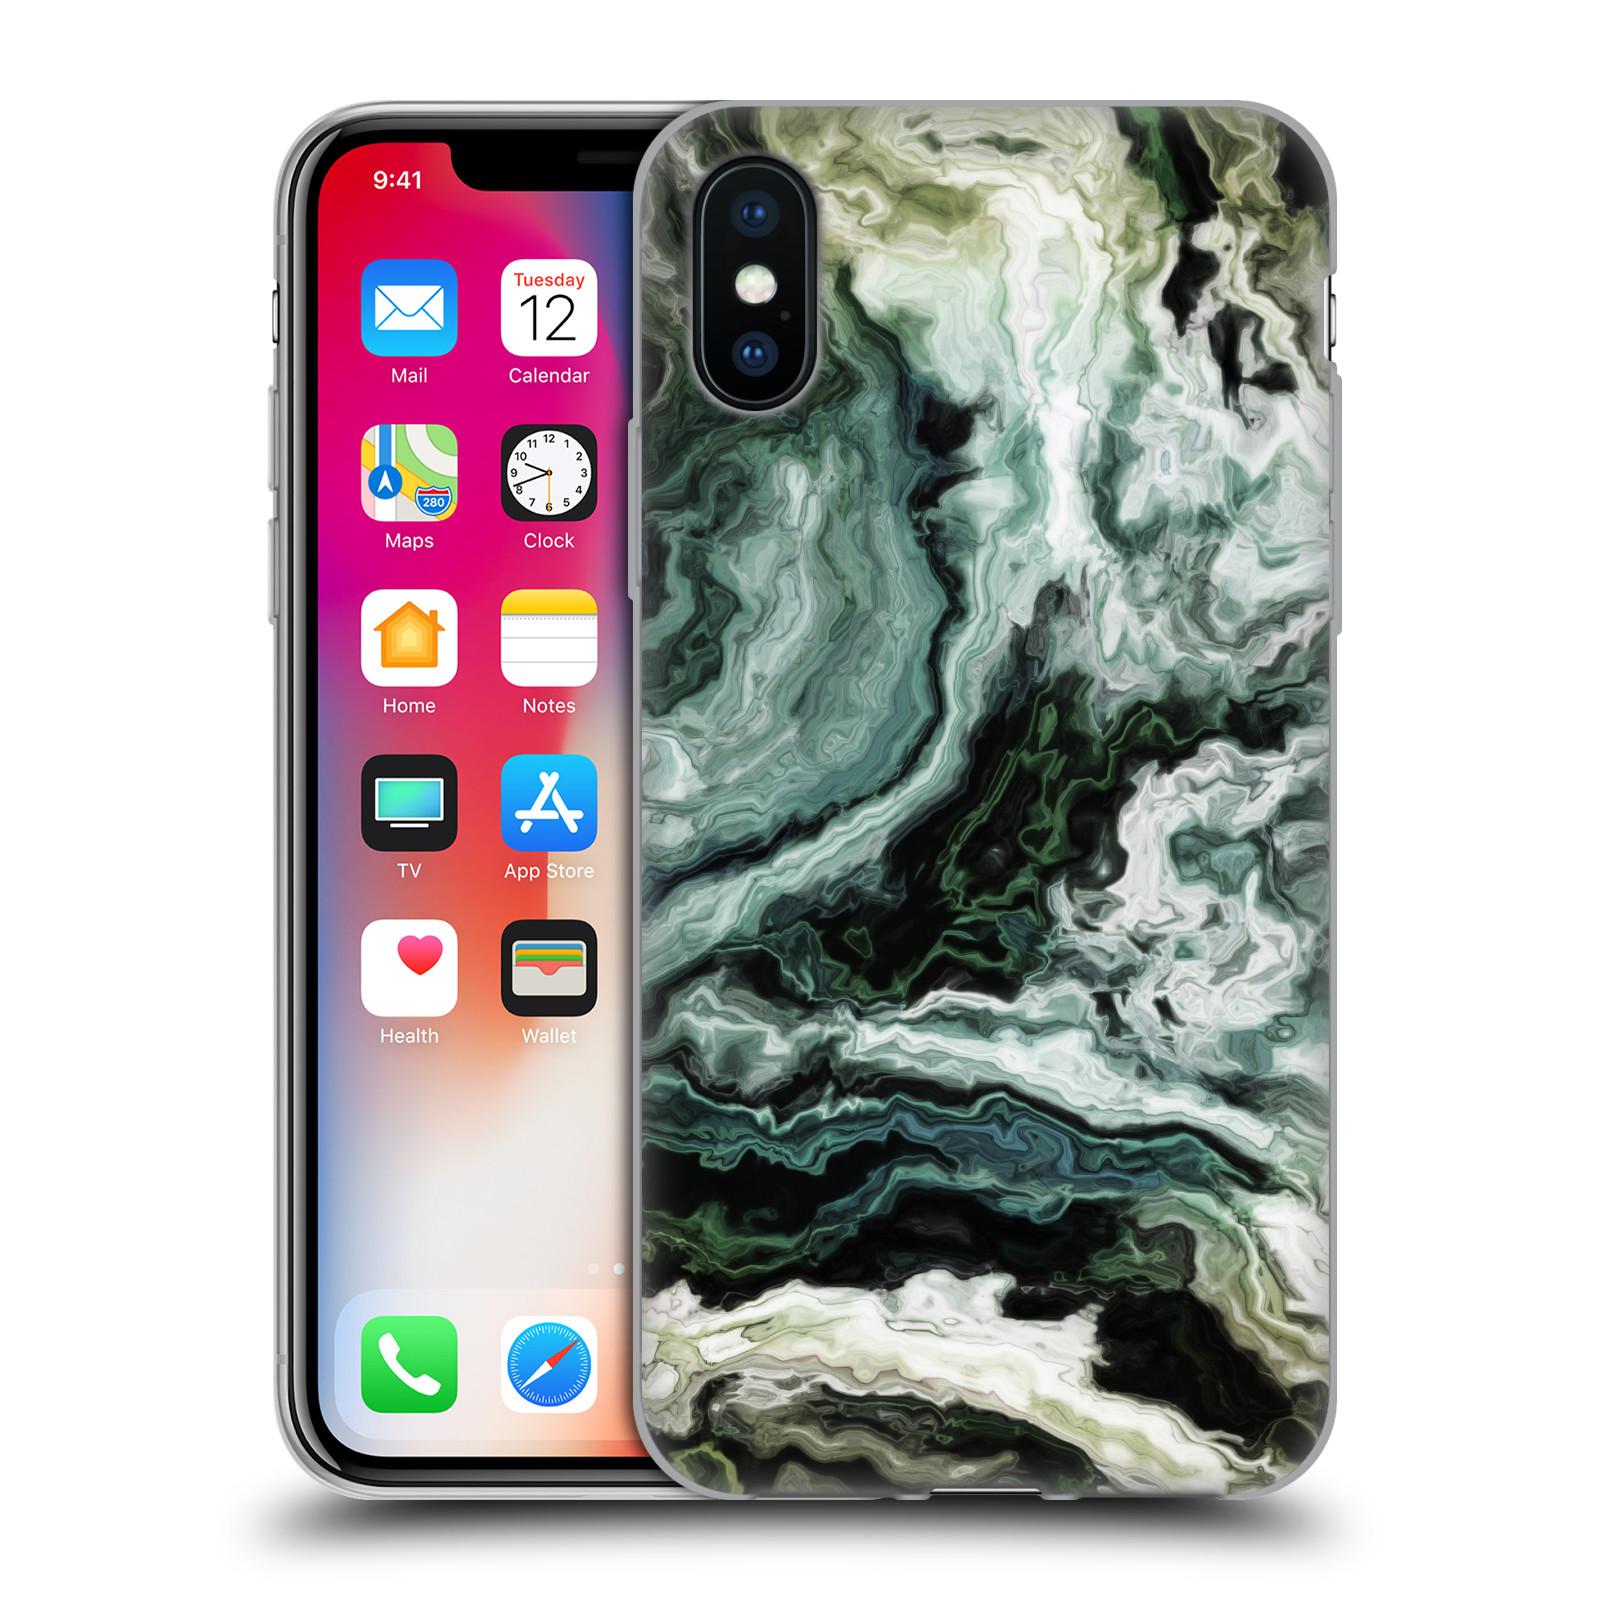 UFFICIALE-HAROULITA-MARMOREO-2-COVER-MORBIDA-IN-GEL-PER-APPLE-iPHONE-TELEFONI